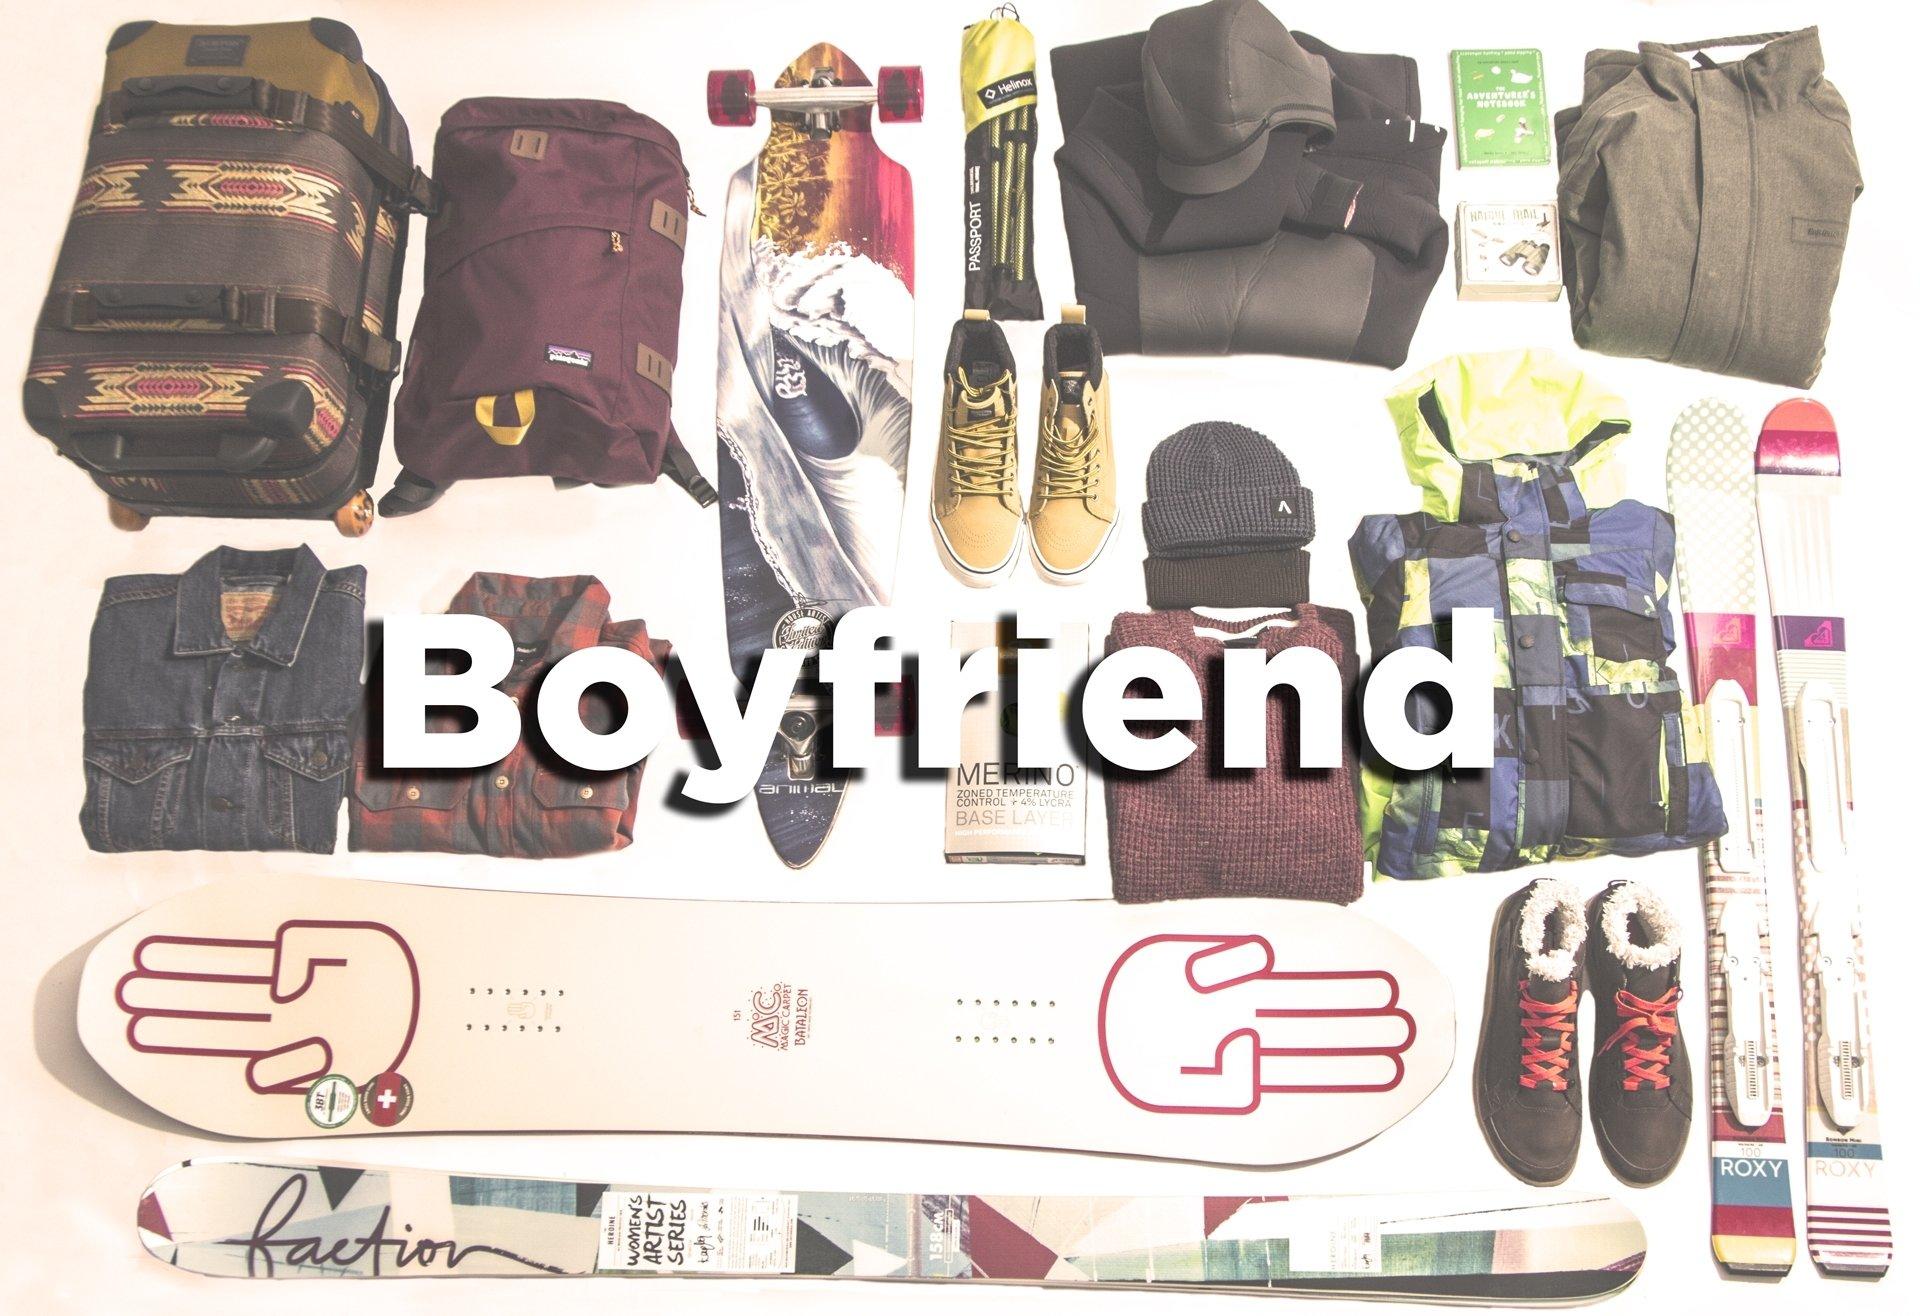 10 Beautiful Christmas Gift Ideas For Boyfriend christmas gift ideas for a boyfriend 15 great gifts 3 2021